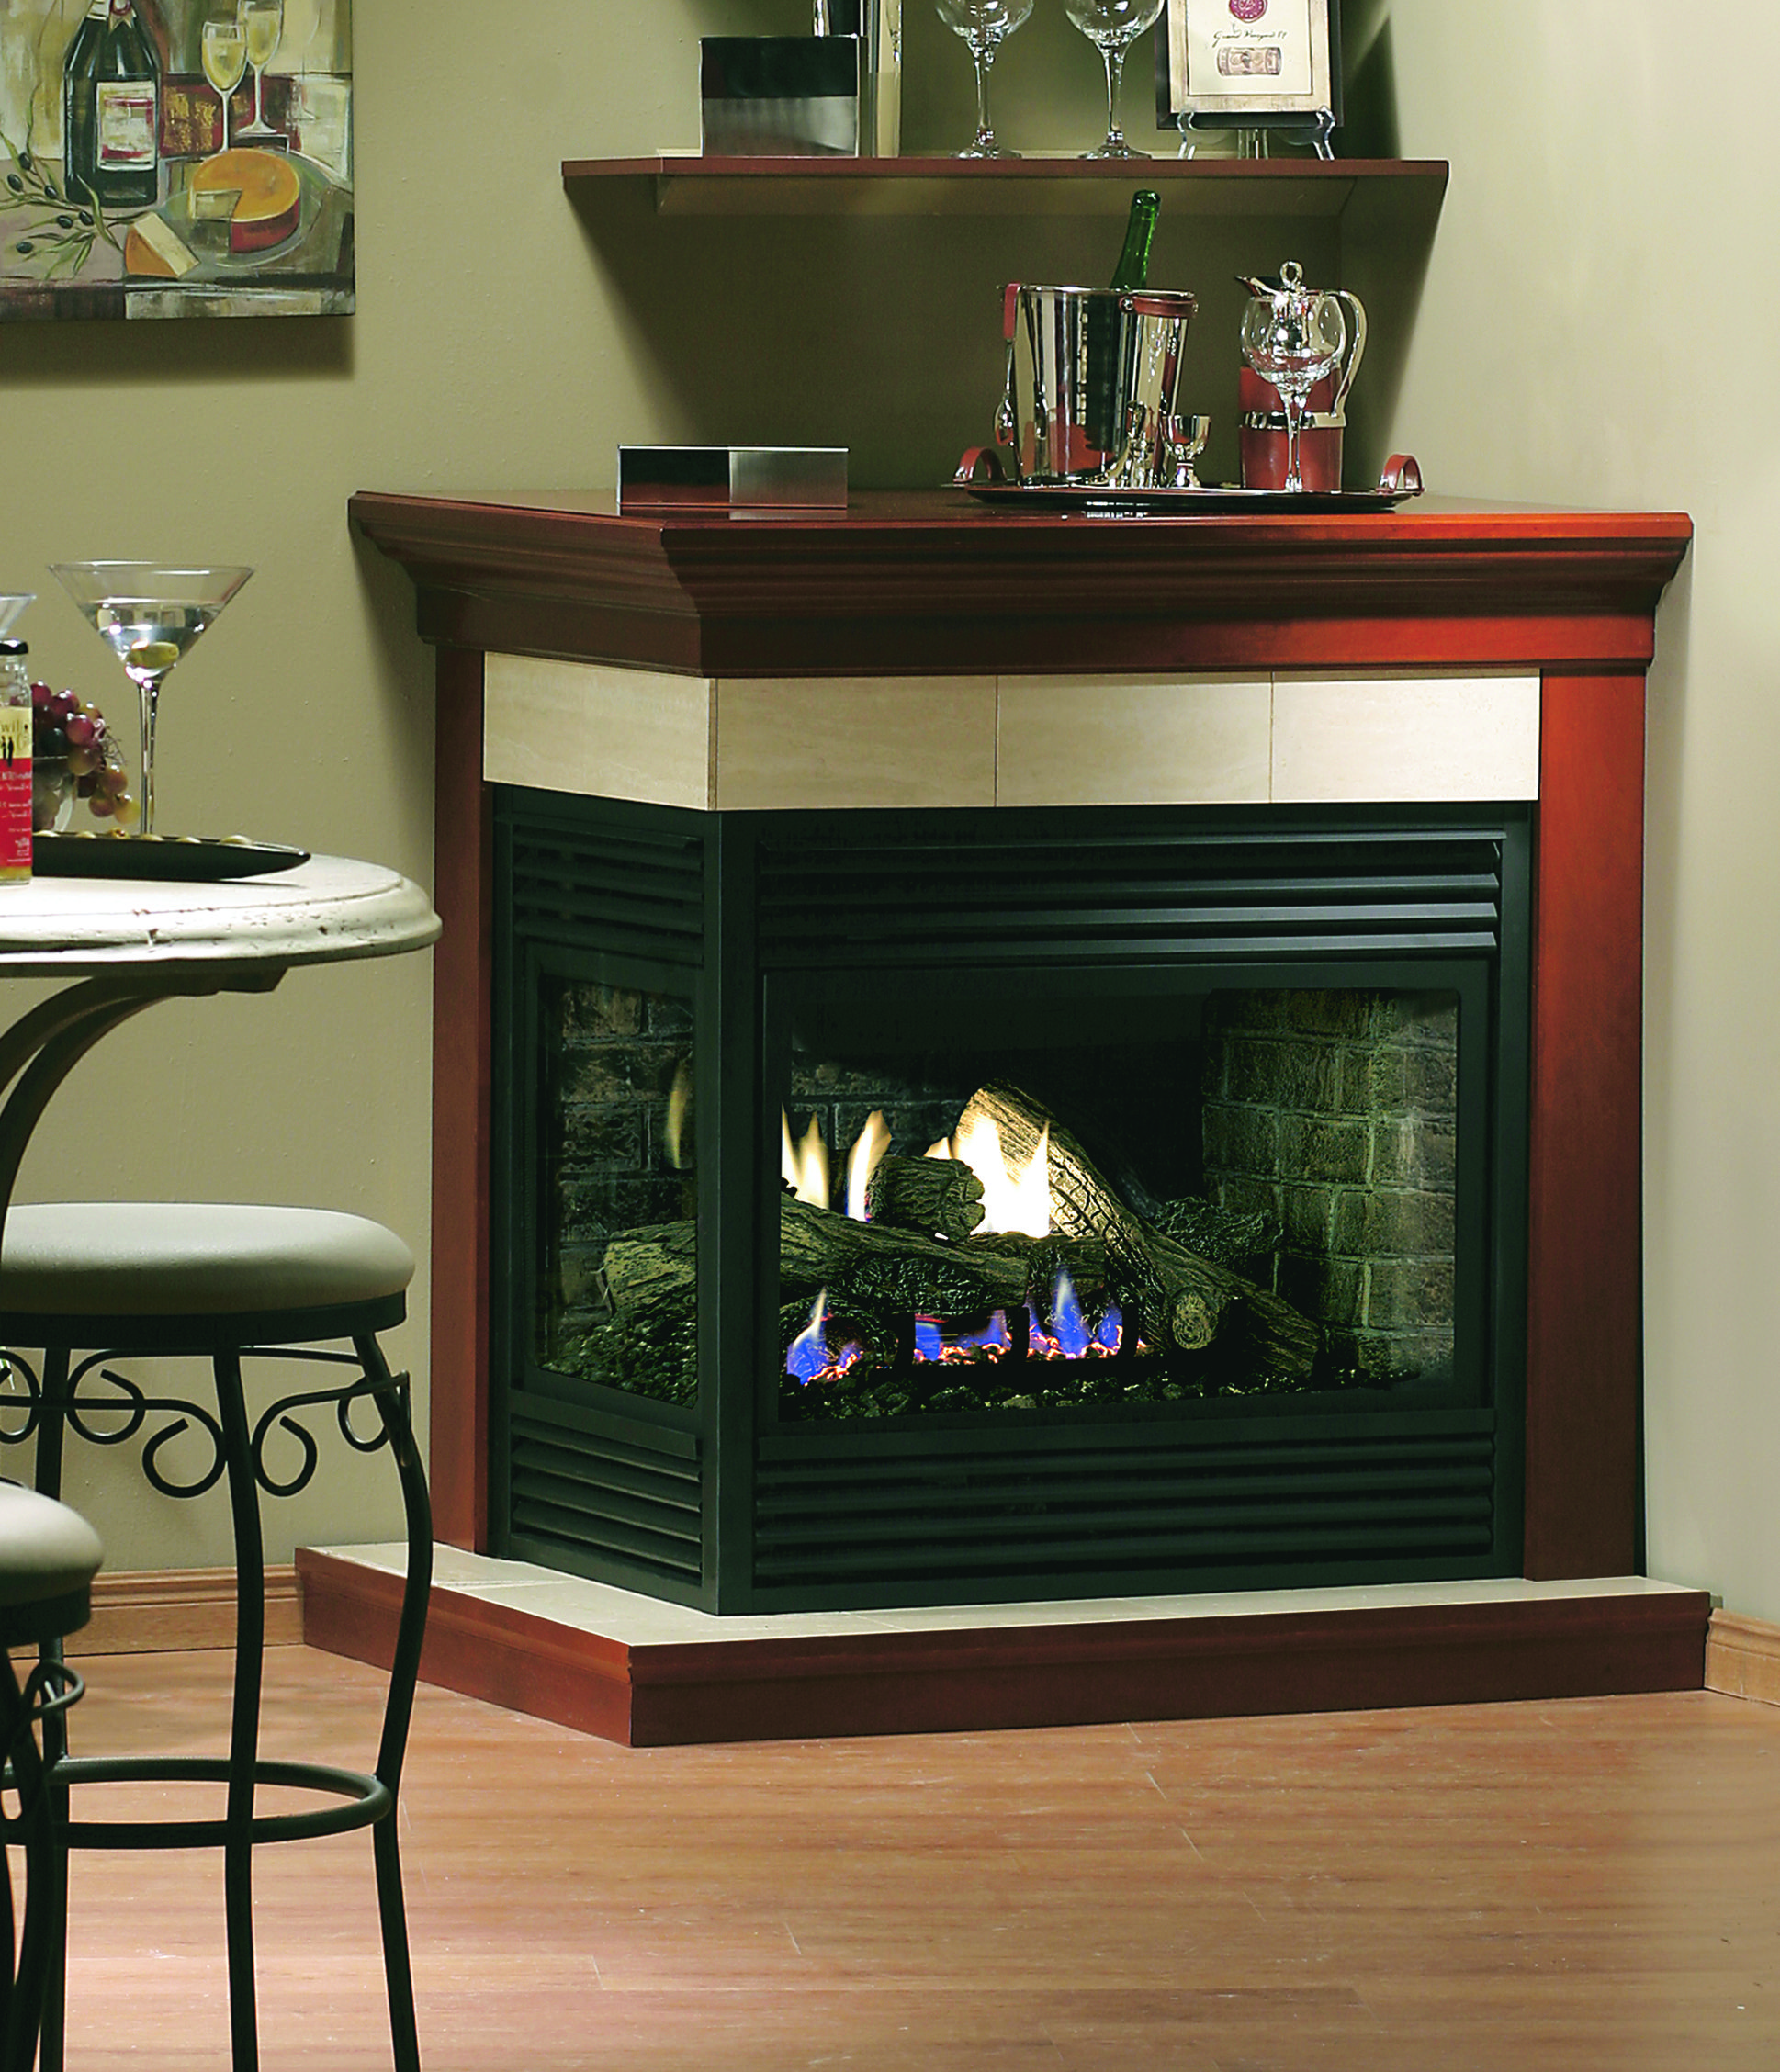 Kingsman Fireplace Fireplace Stores Fireplace Home Fireplace